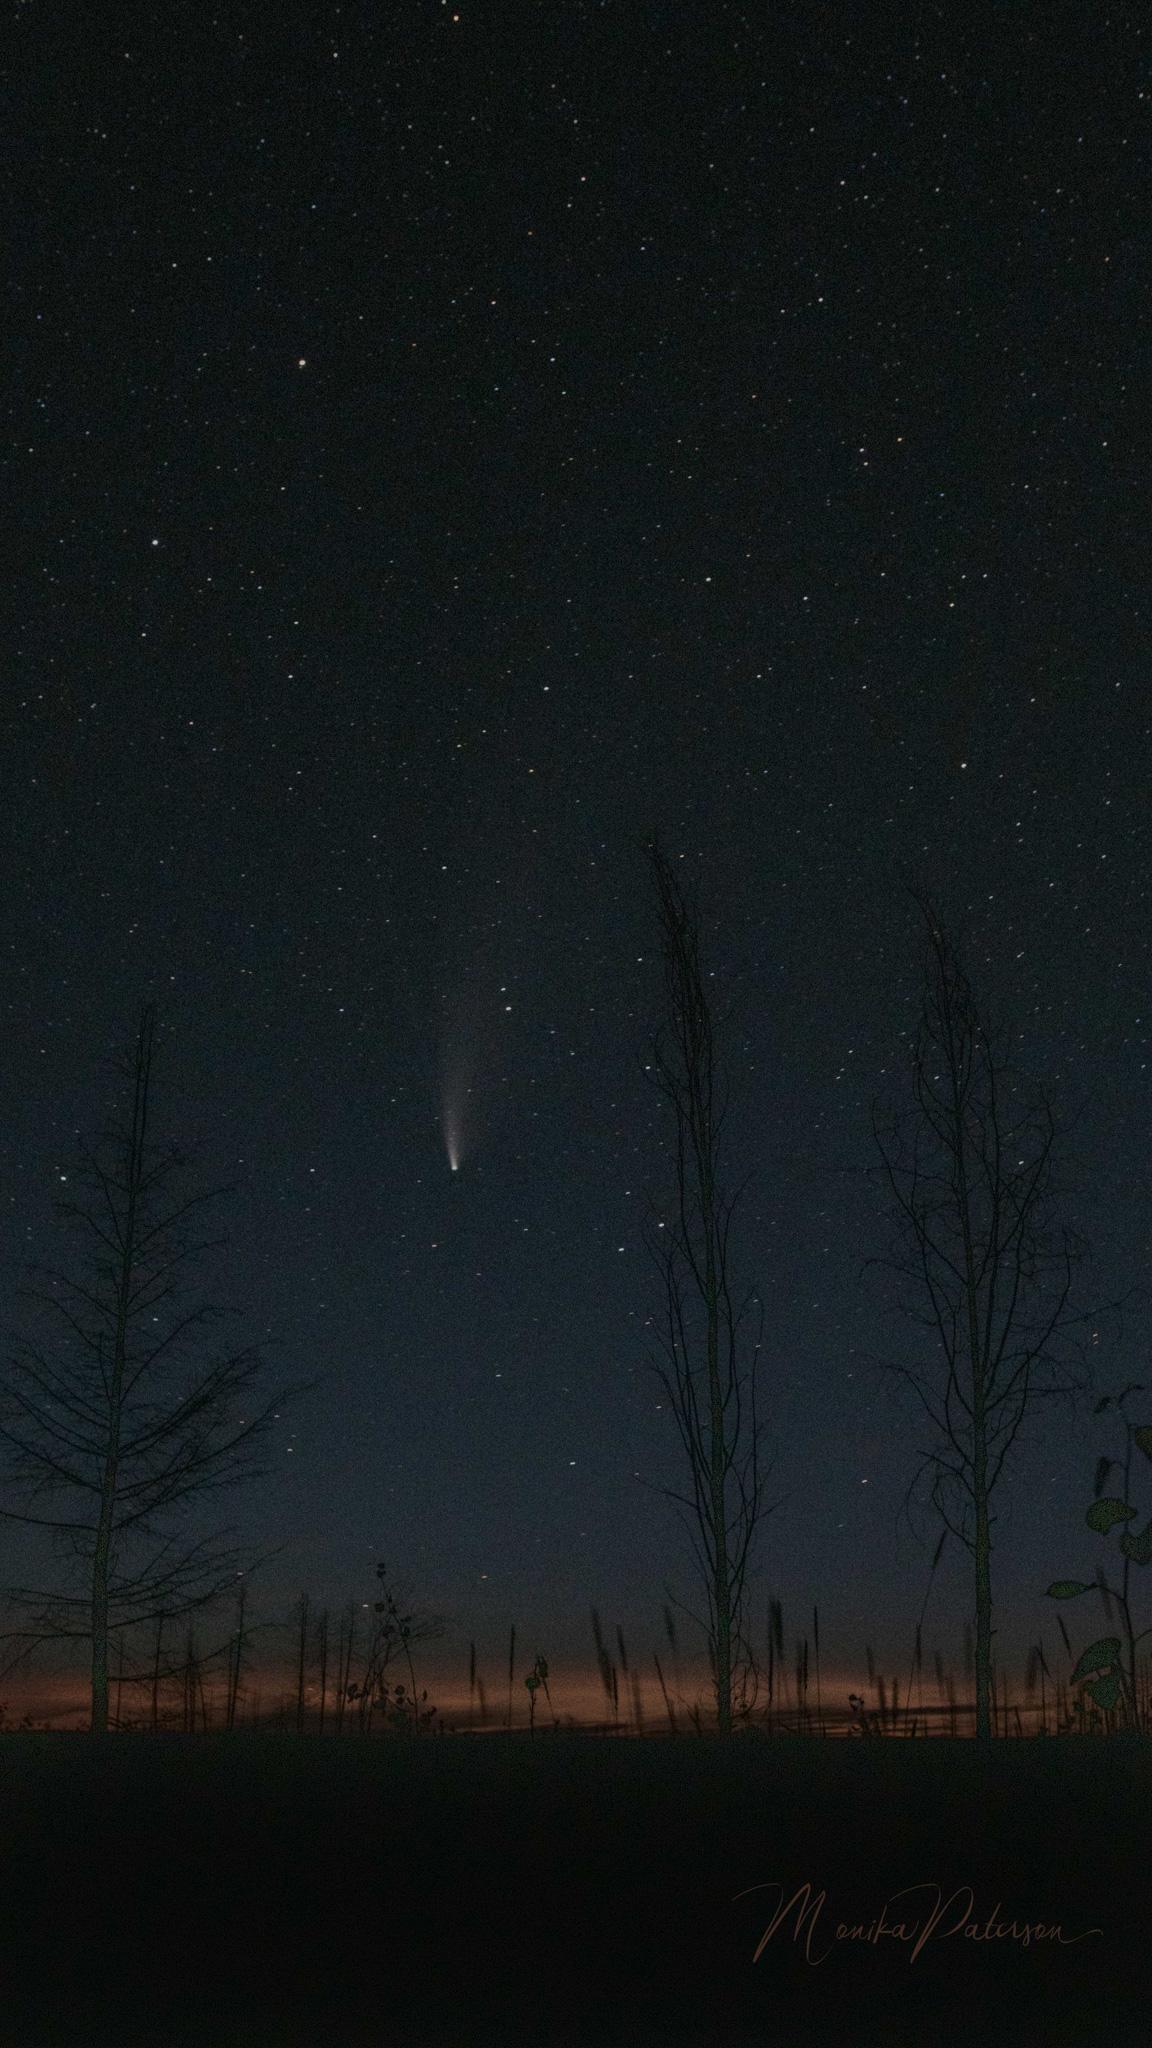 Comet Neowise through the trees - Monika Paterson